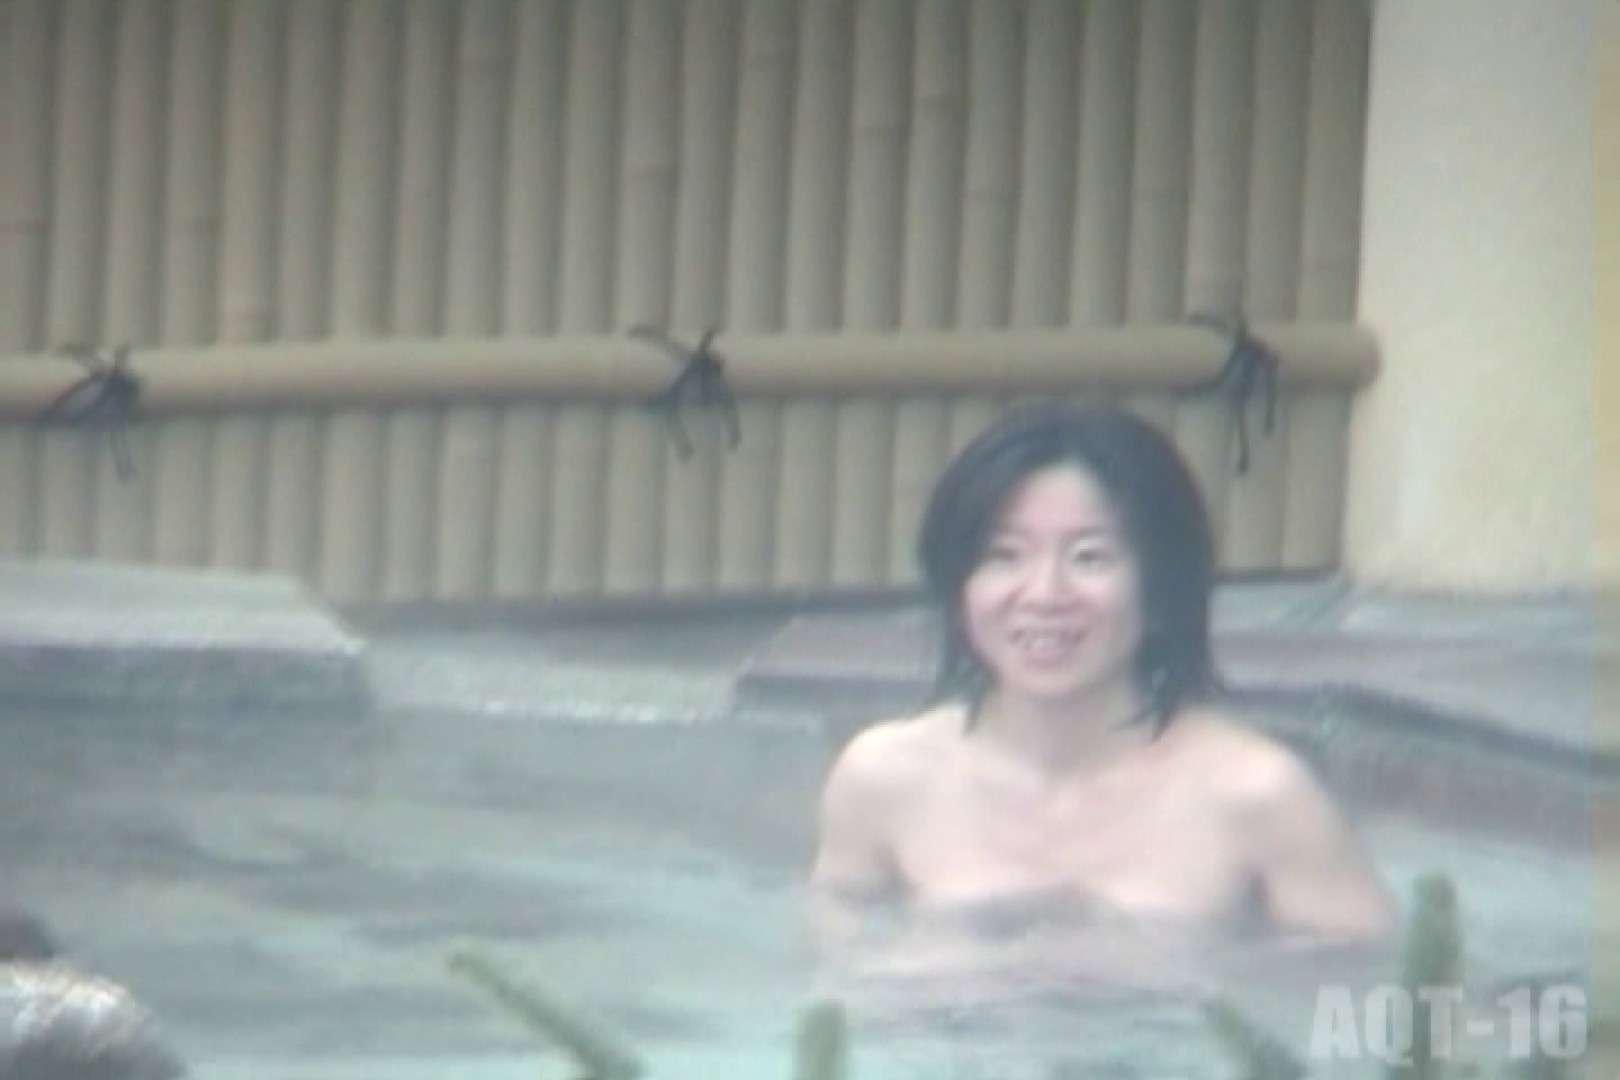 Aquaな露天風呂Vol.841 露天 のぞき動画キャプチャ 86pic 59